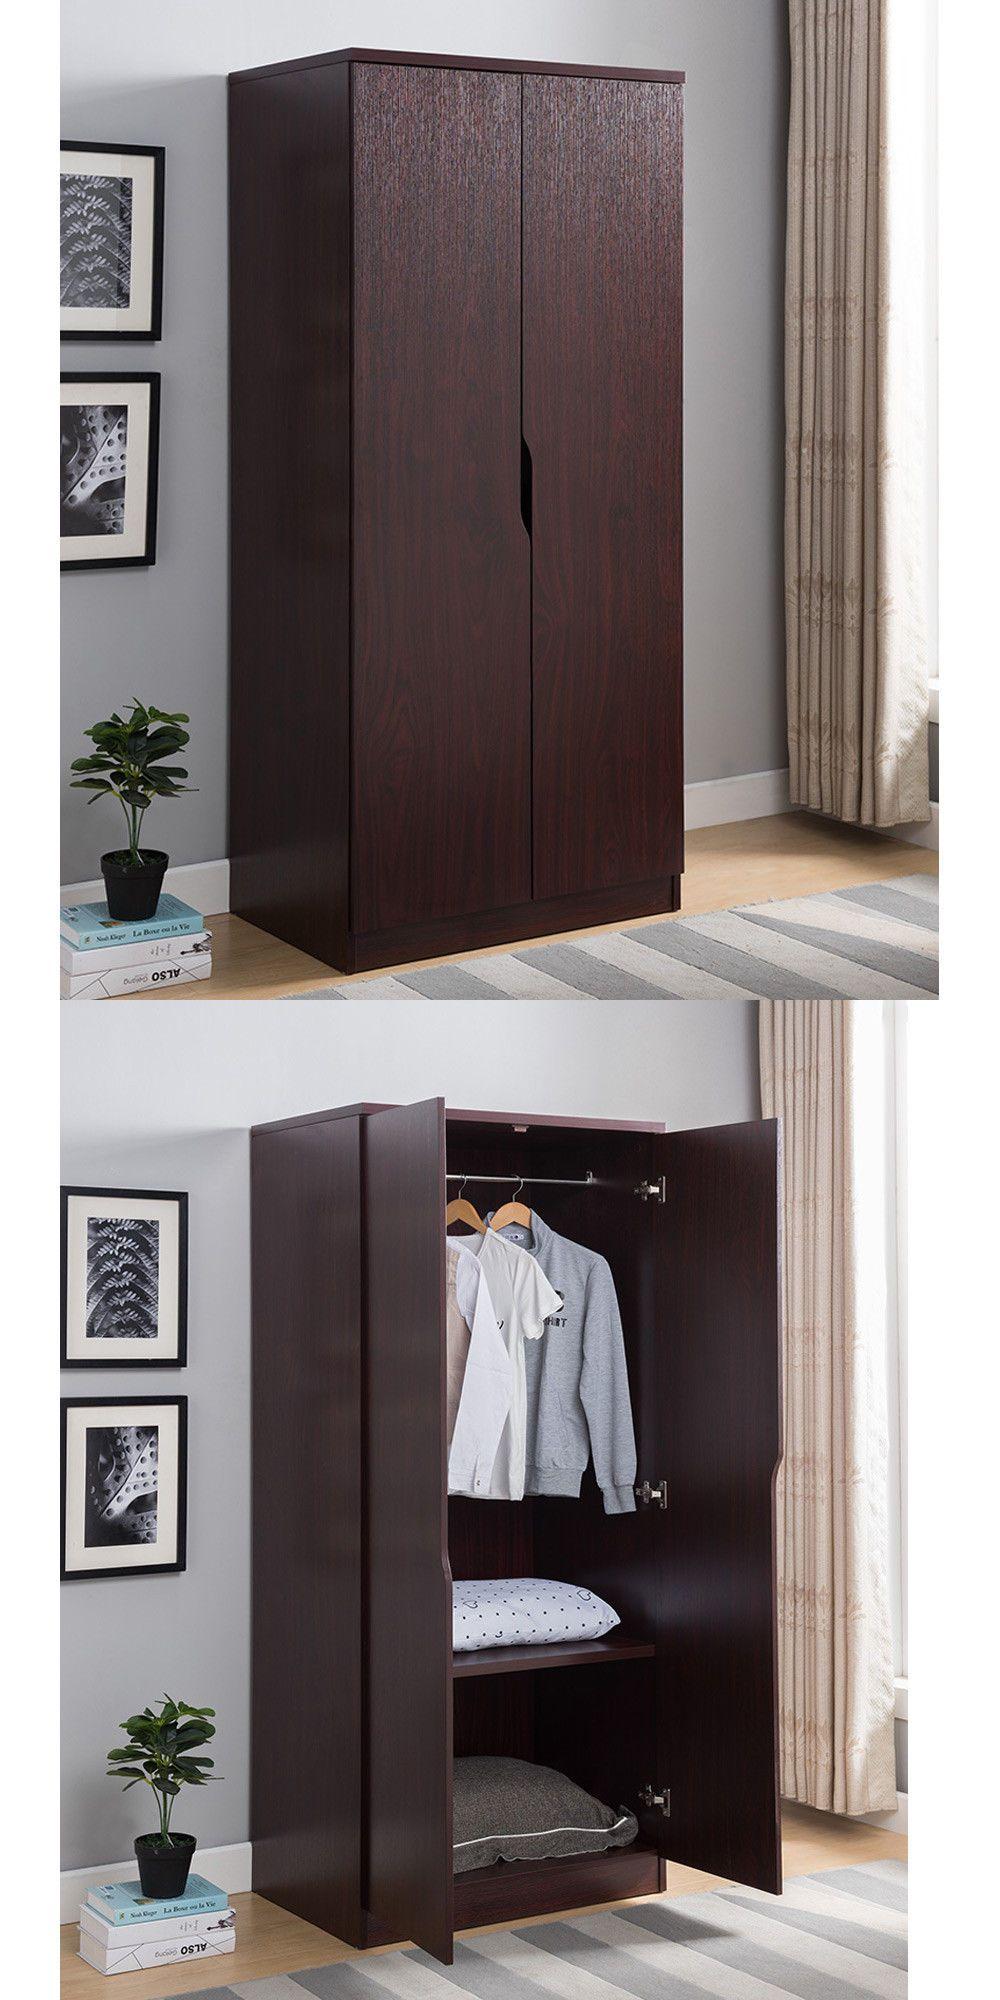 Armoires And Wardrobes 103430 Bedroom Furniture 2 Door Wardrobe Organizer Storage Closet Armoire W Wood Armoire Patio Furniture Redo Victorian Furniture Decor